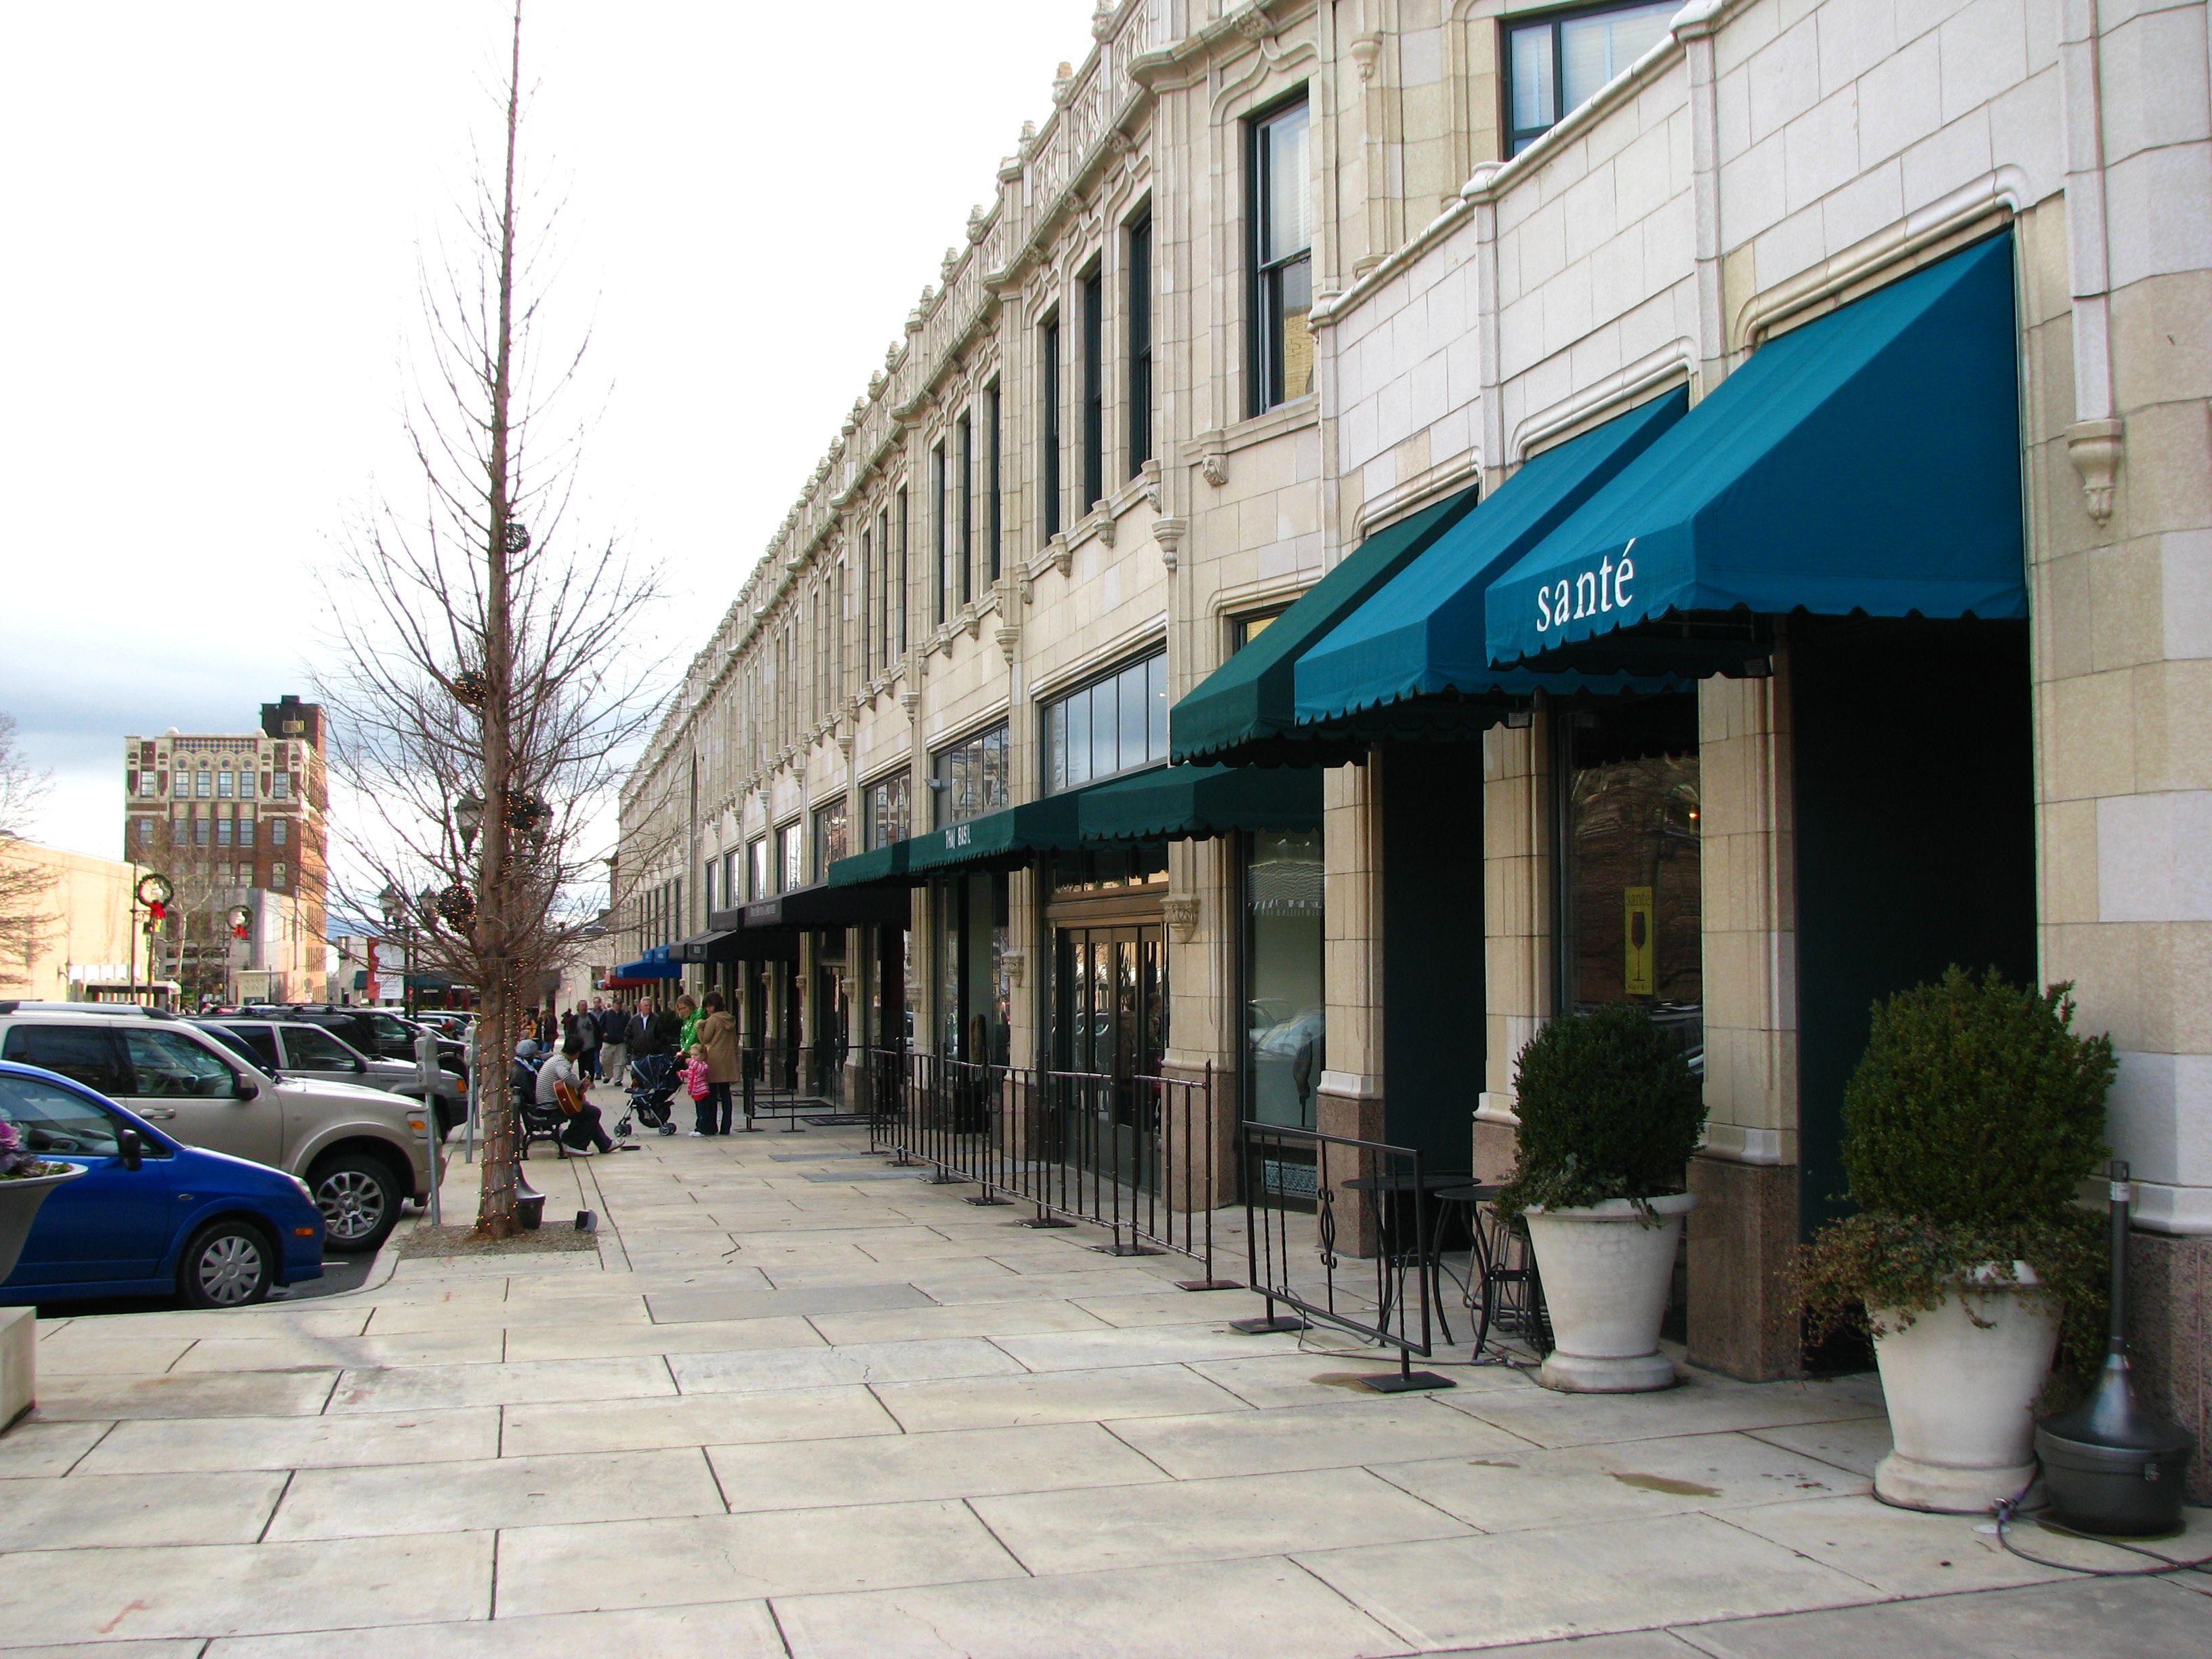 Sante Wine Bar and Retail Shop